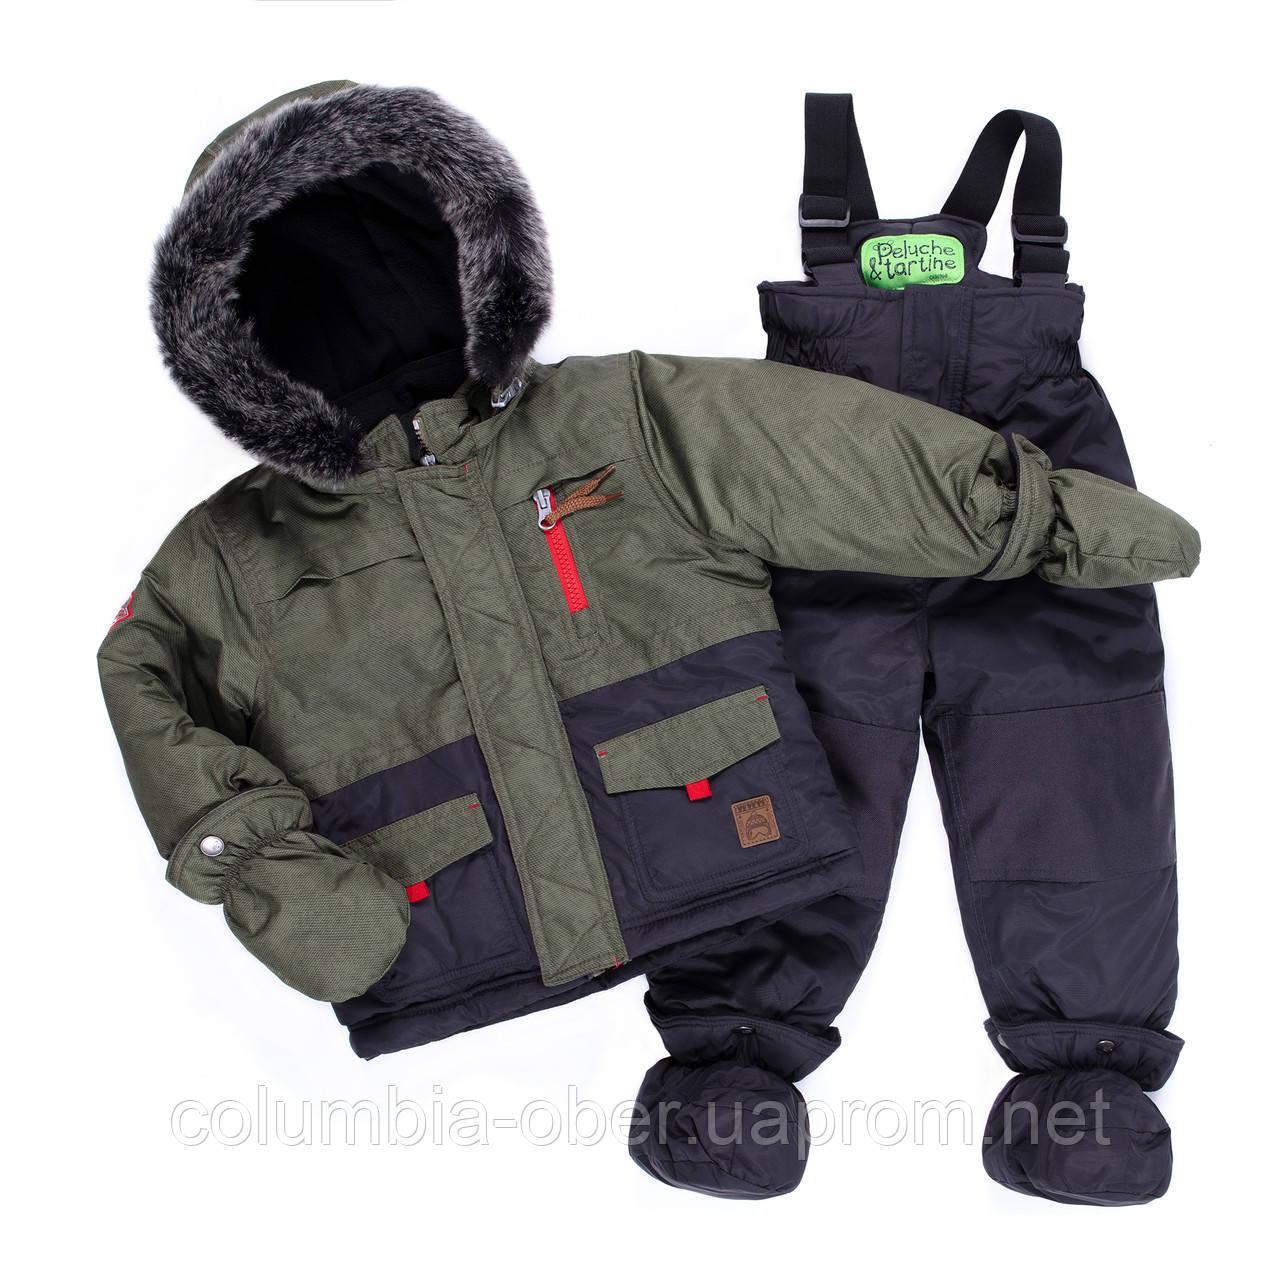 Зимний комплект для мальчика PELUCHE & TARTINE FF19M13BG Olive/DeepGray. Размеры 12 мес-3 года.